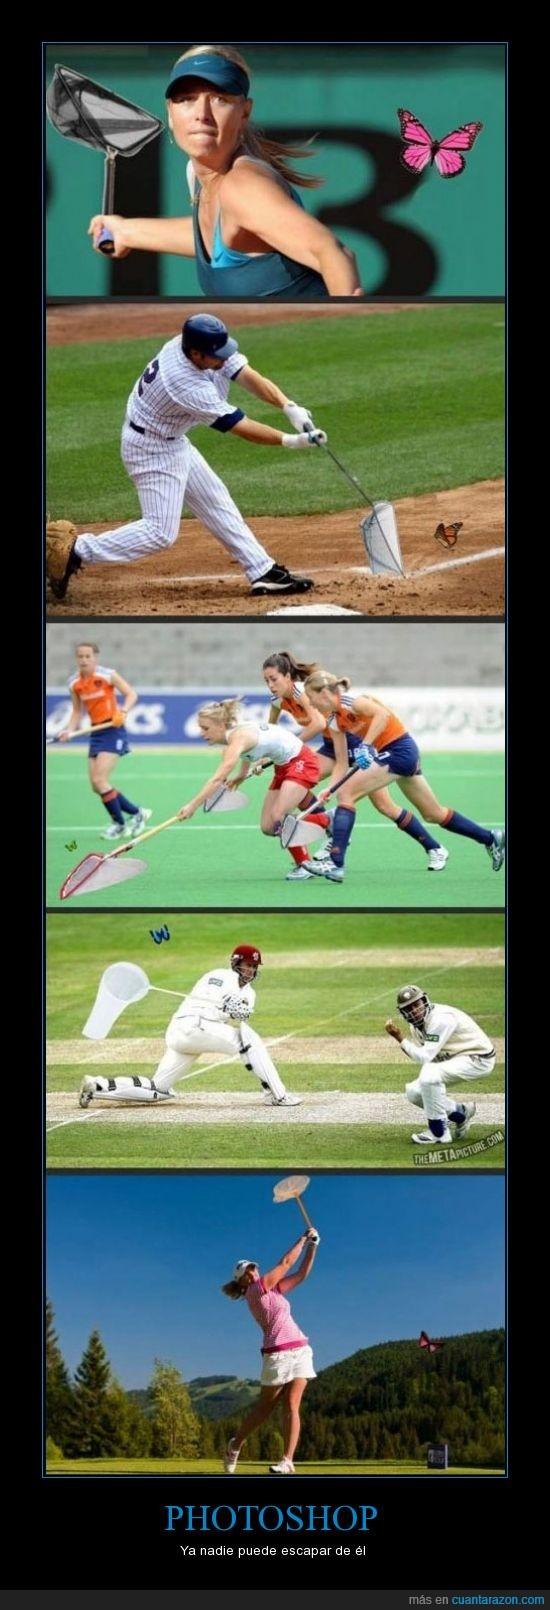 atletas,atrapar,mariposas,photoshop